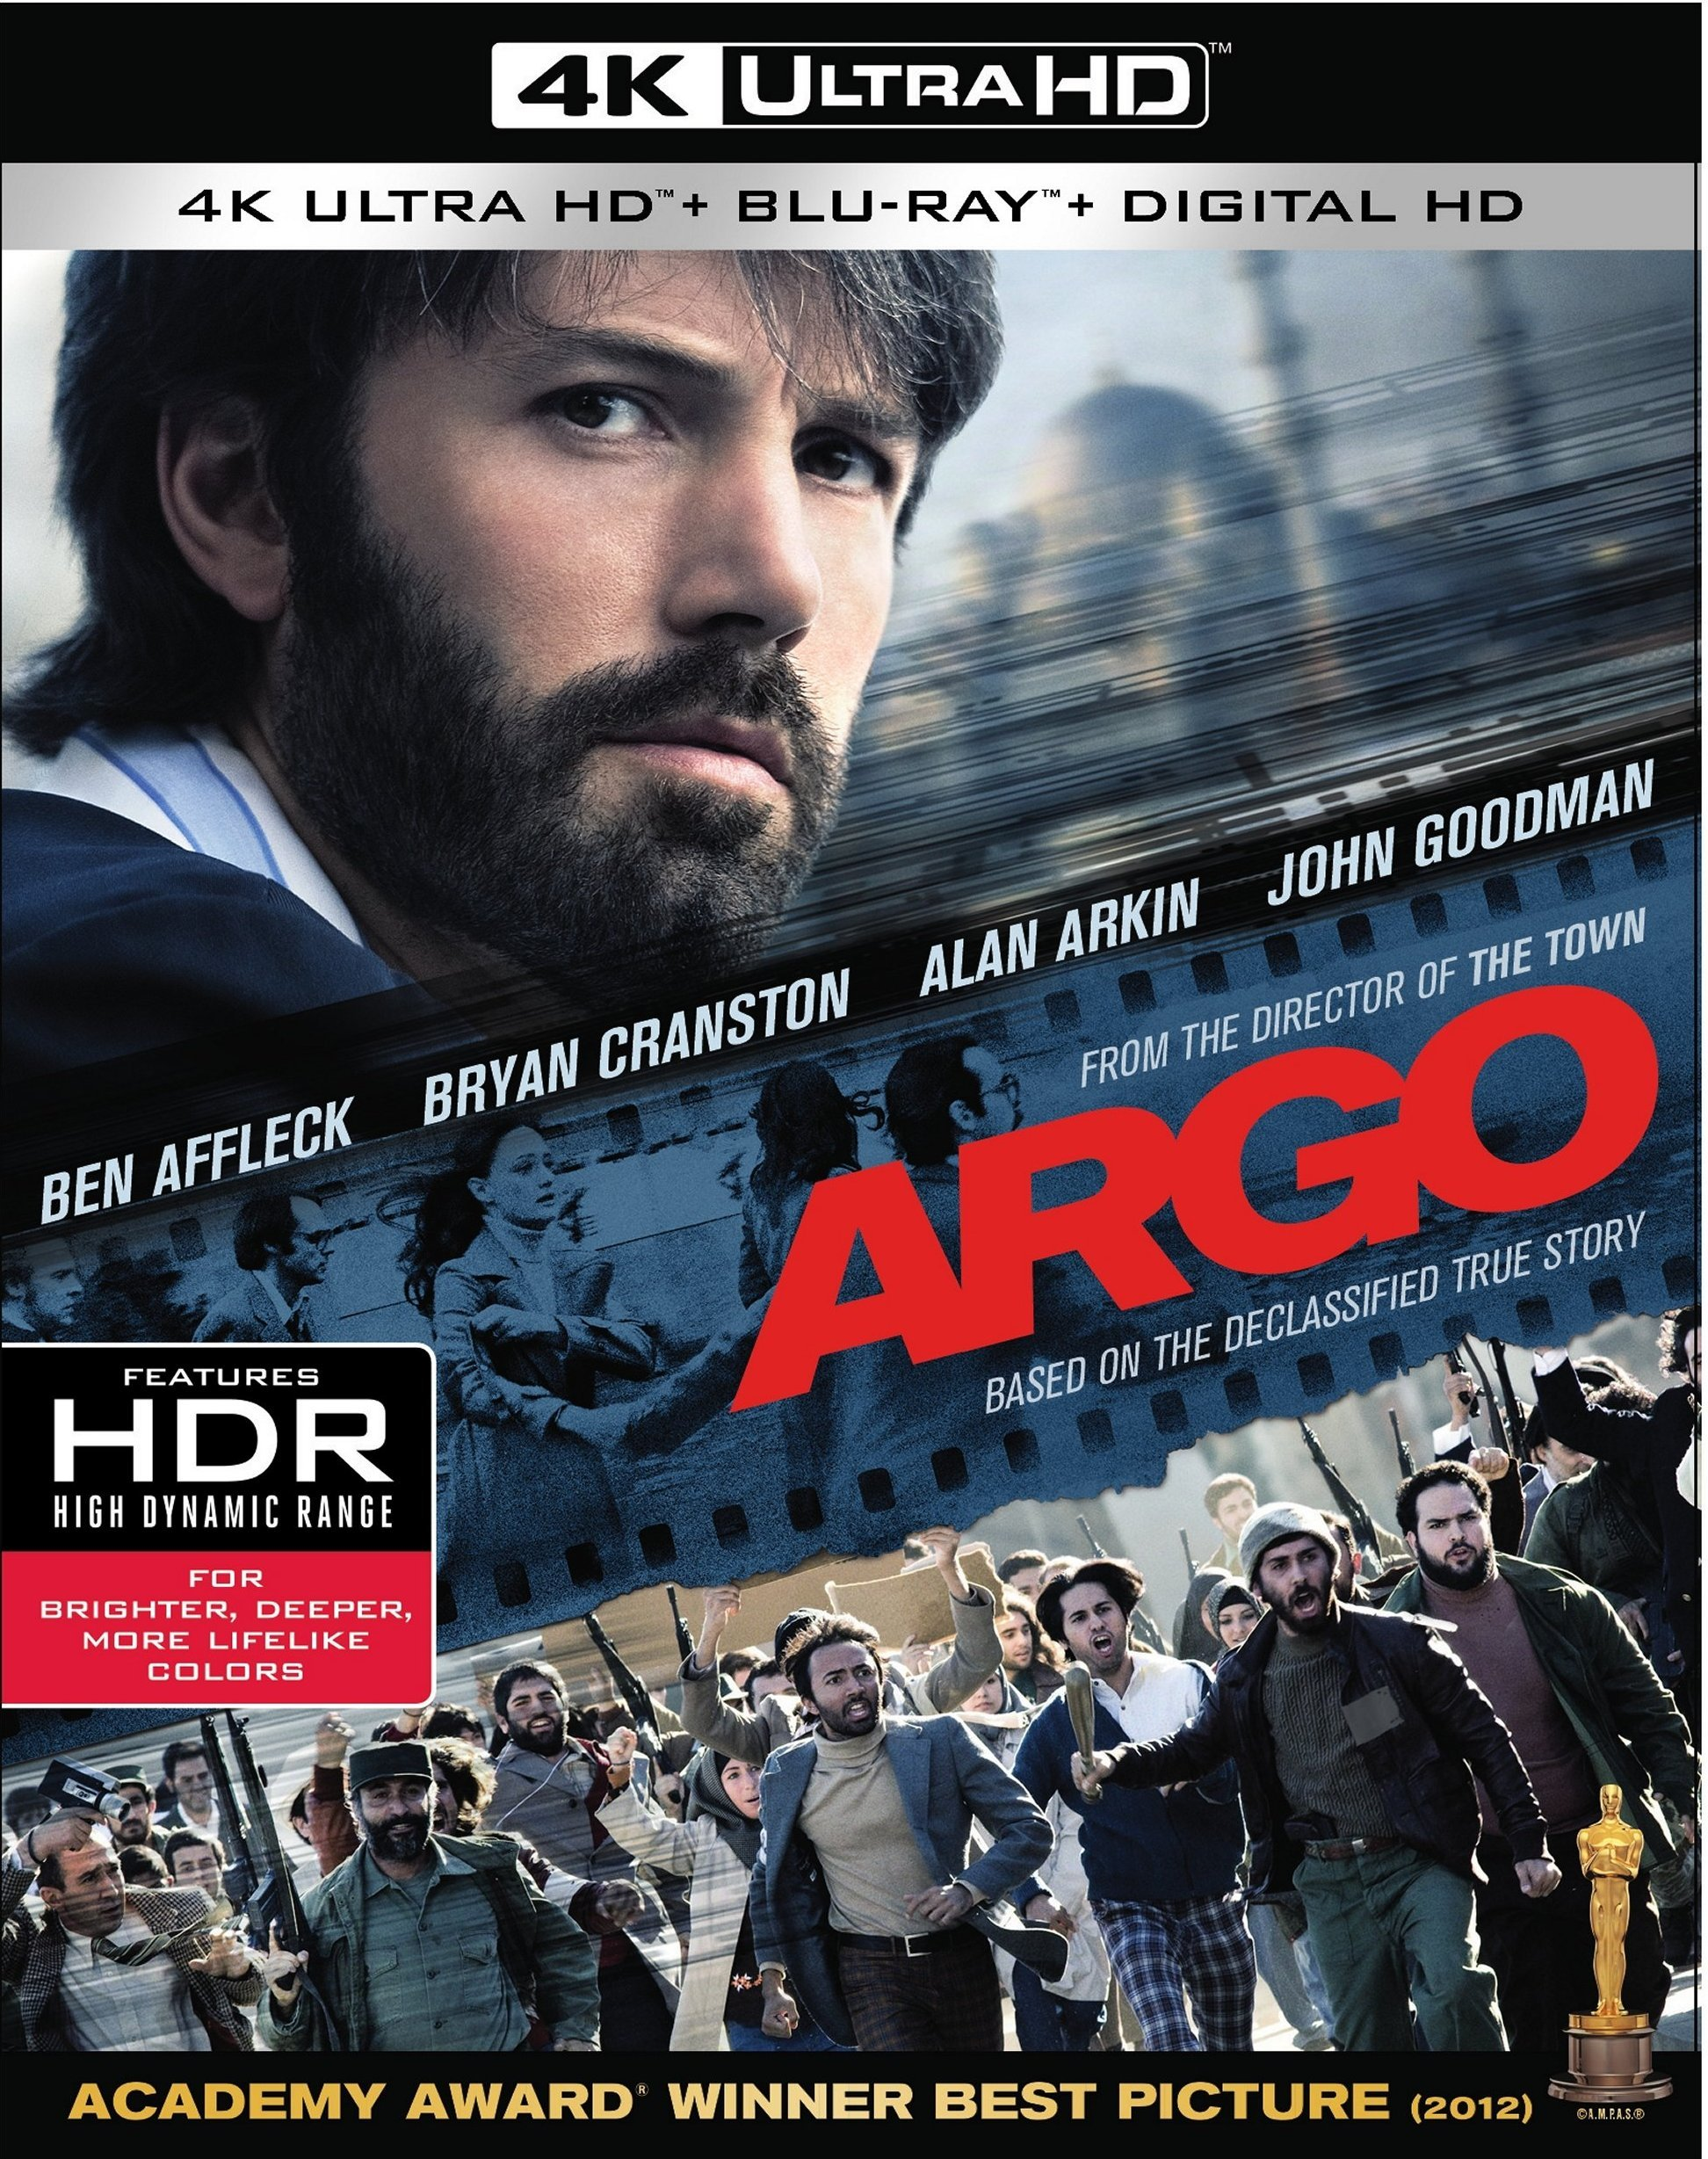 Argo (2012) 4K Ultra HD Blu-ray